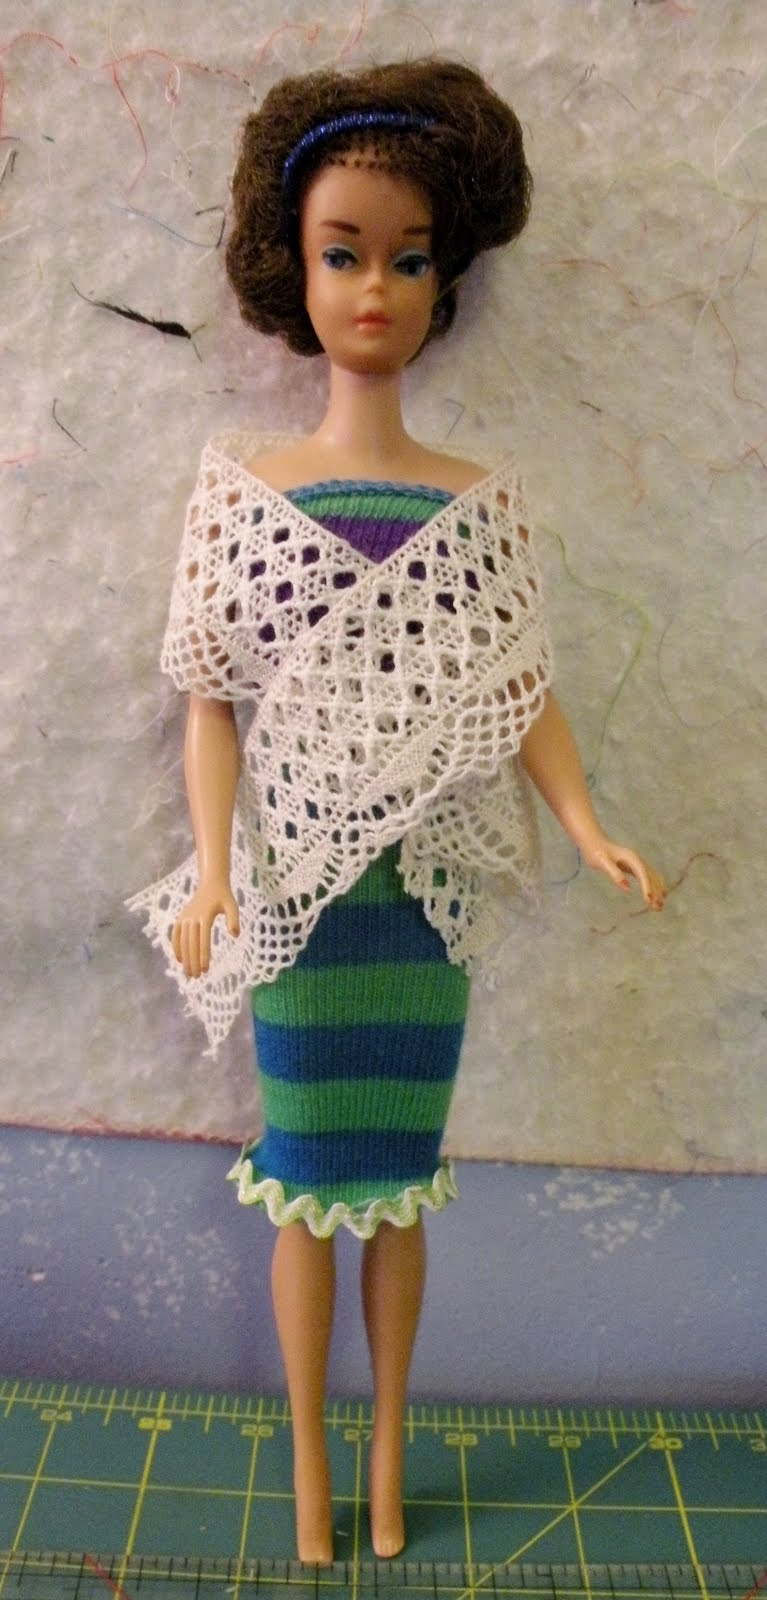 Giraffe Dreams: Barbie Doll Clothes - Yikes!